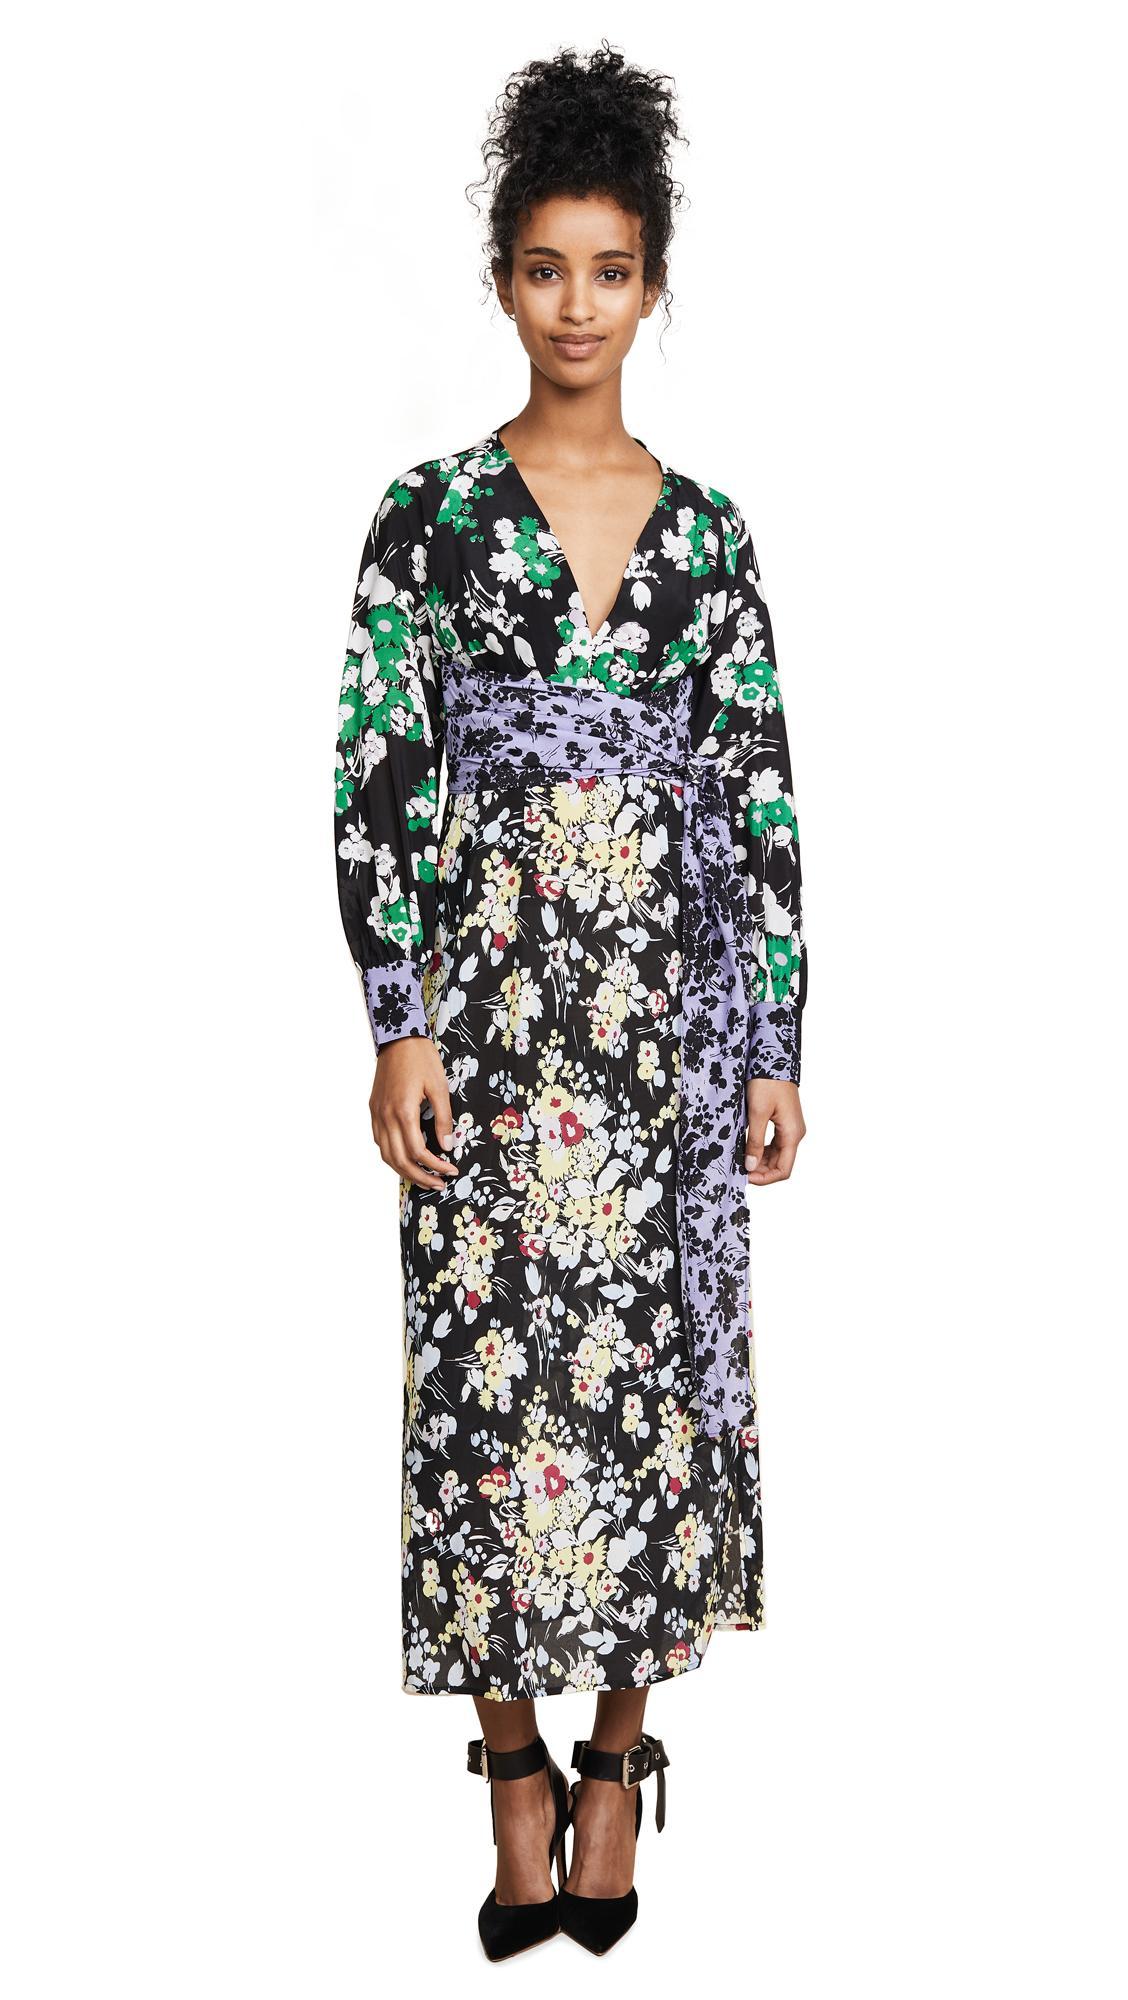 443f7cf30f9 Rixo London Fedora Dress In Mixed 30's Bunch Floral | ModeSens